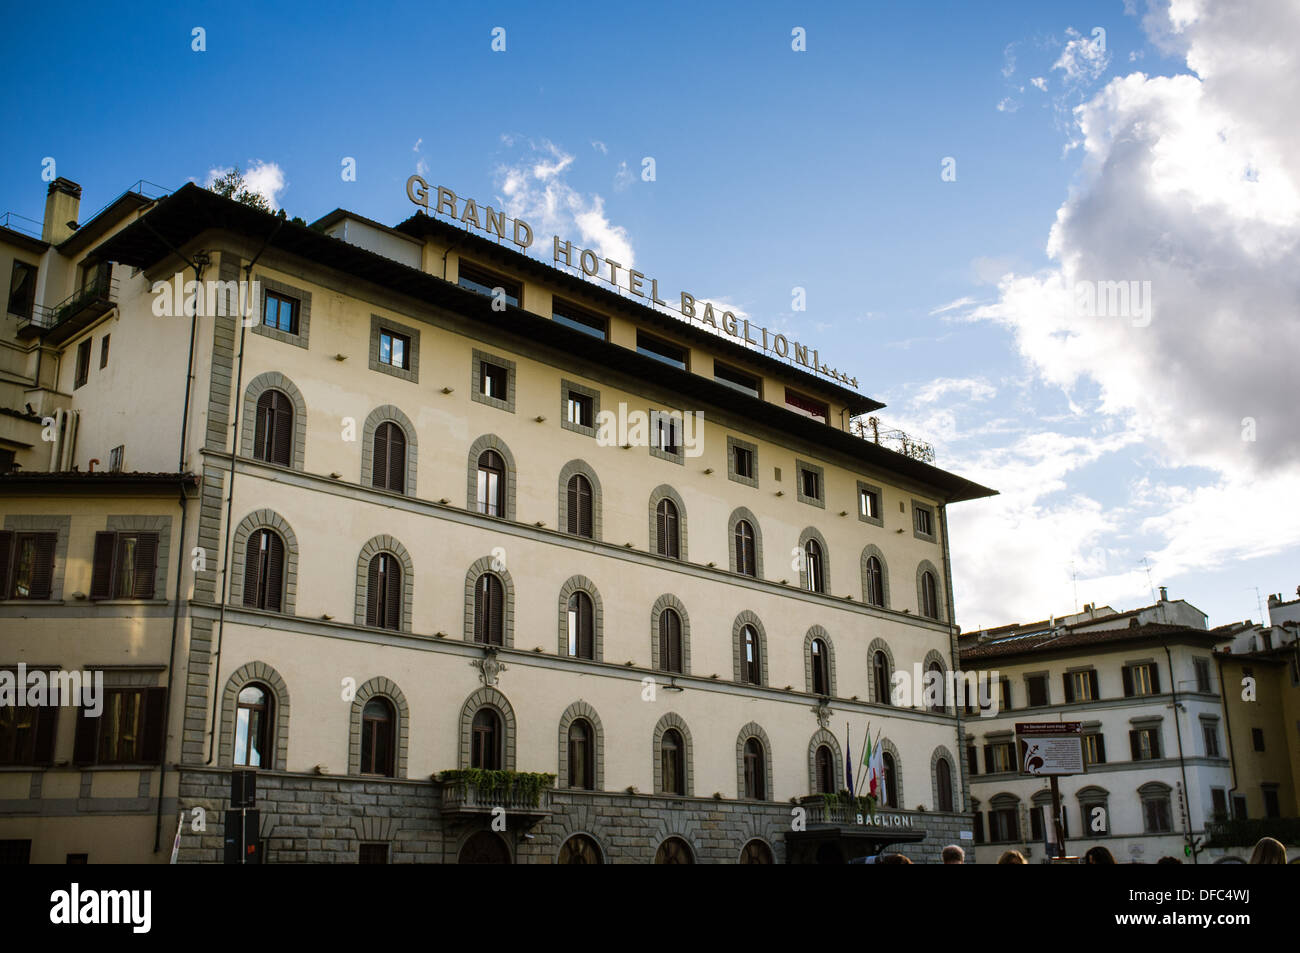 Grand Hotel Baglioni Florence Italy Stock Photo Alamy